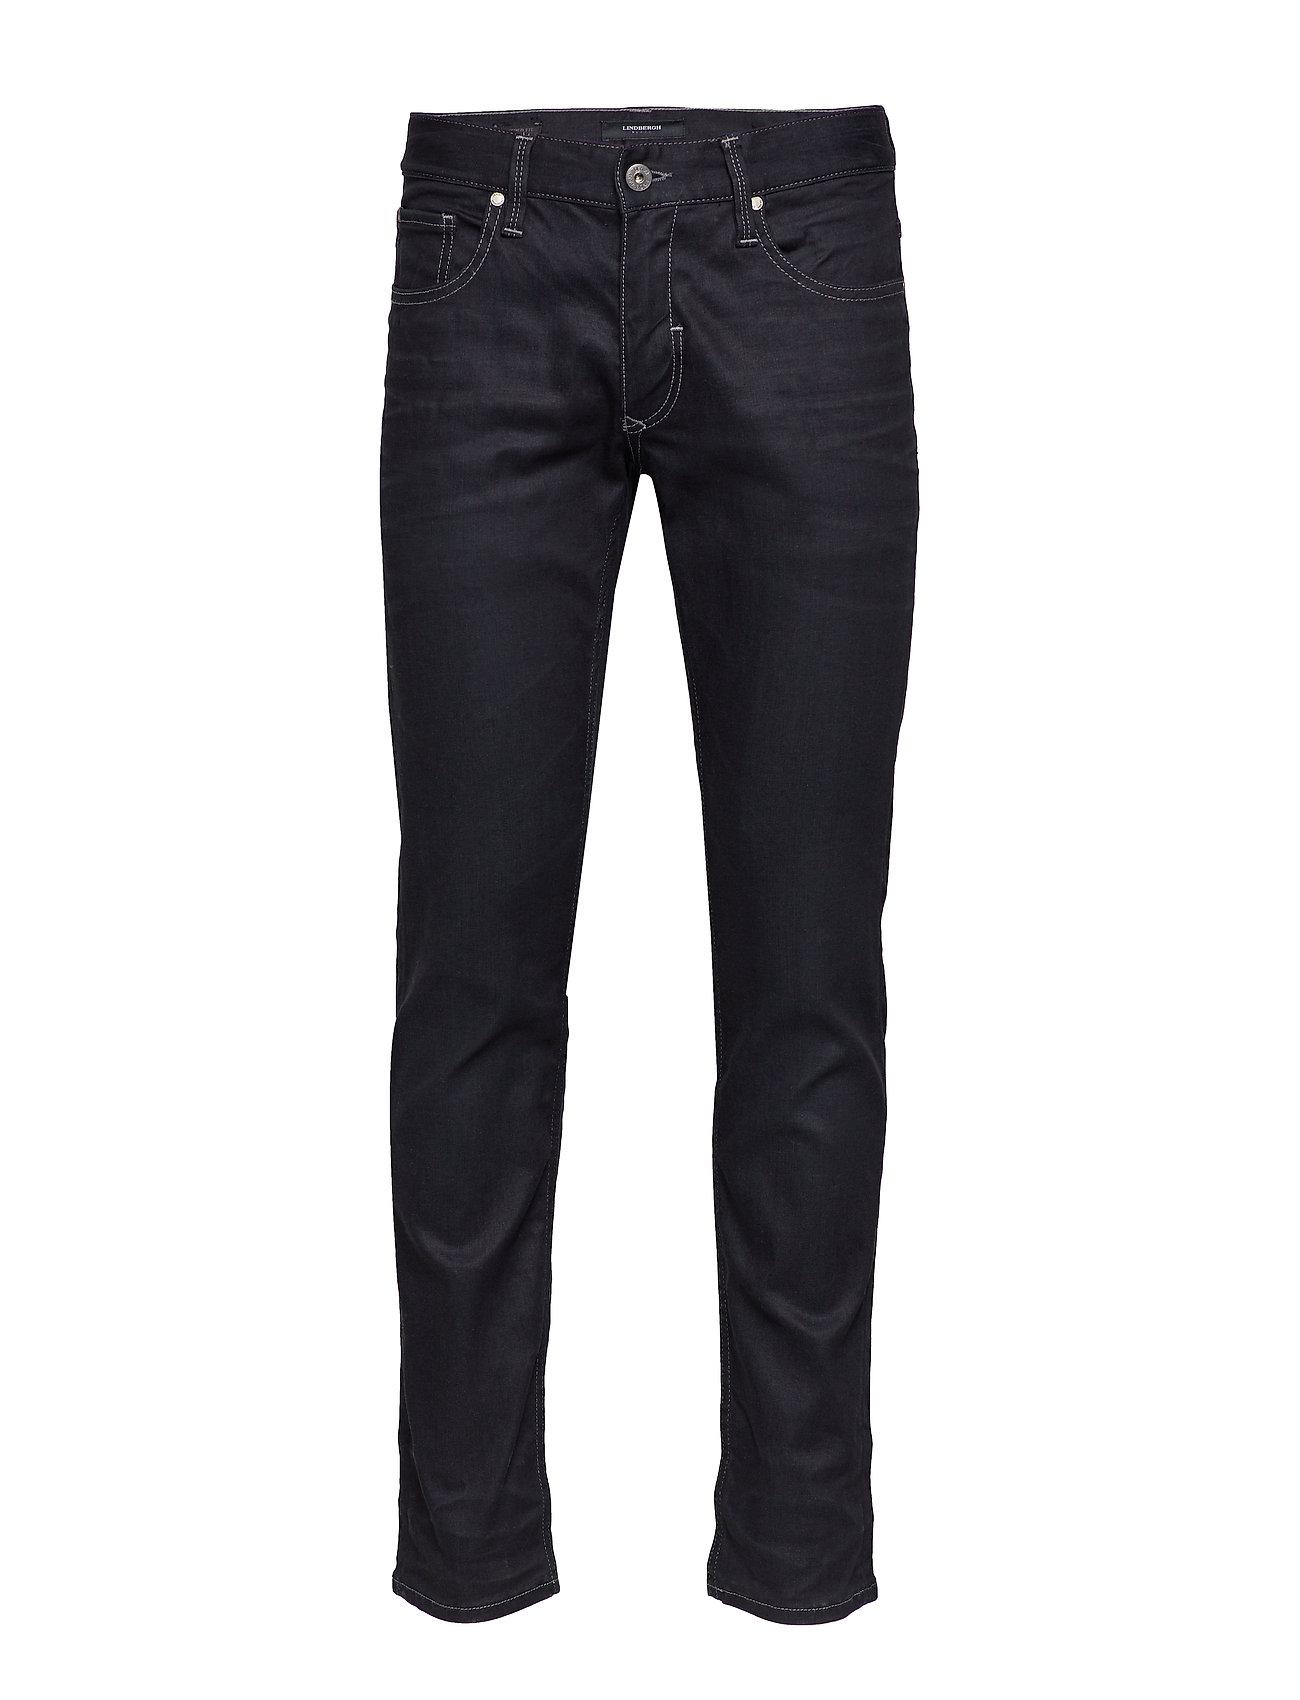 Lindbergh Superflex jeans OB - OVERDYED BLUE